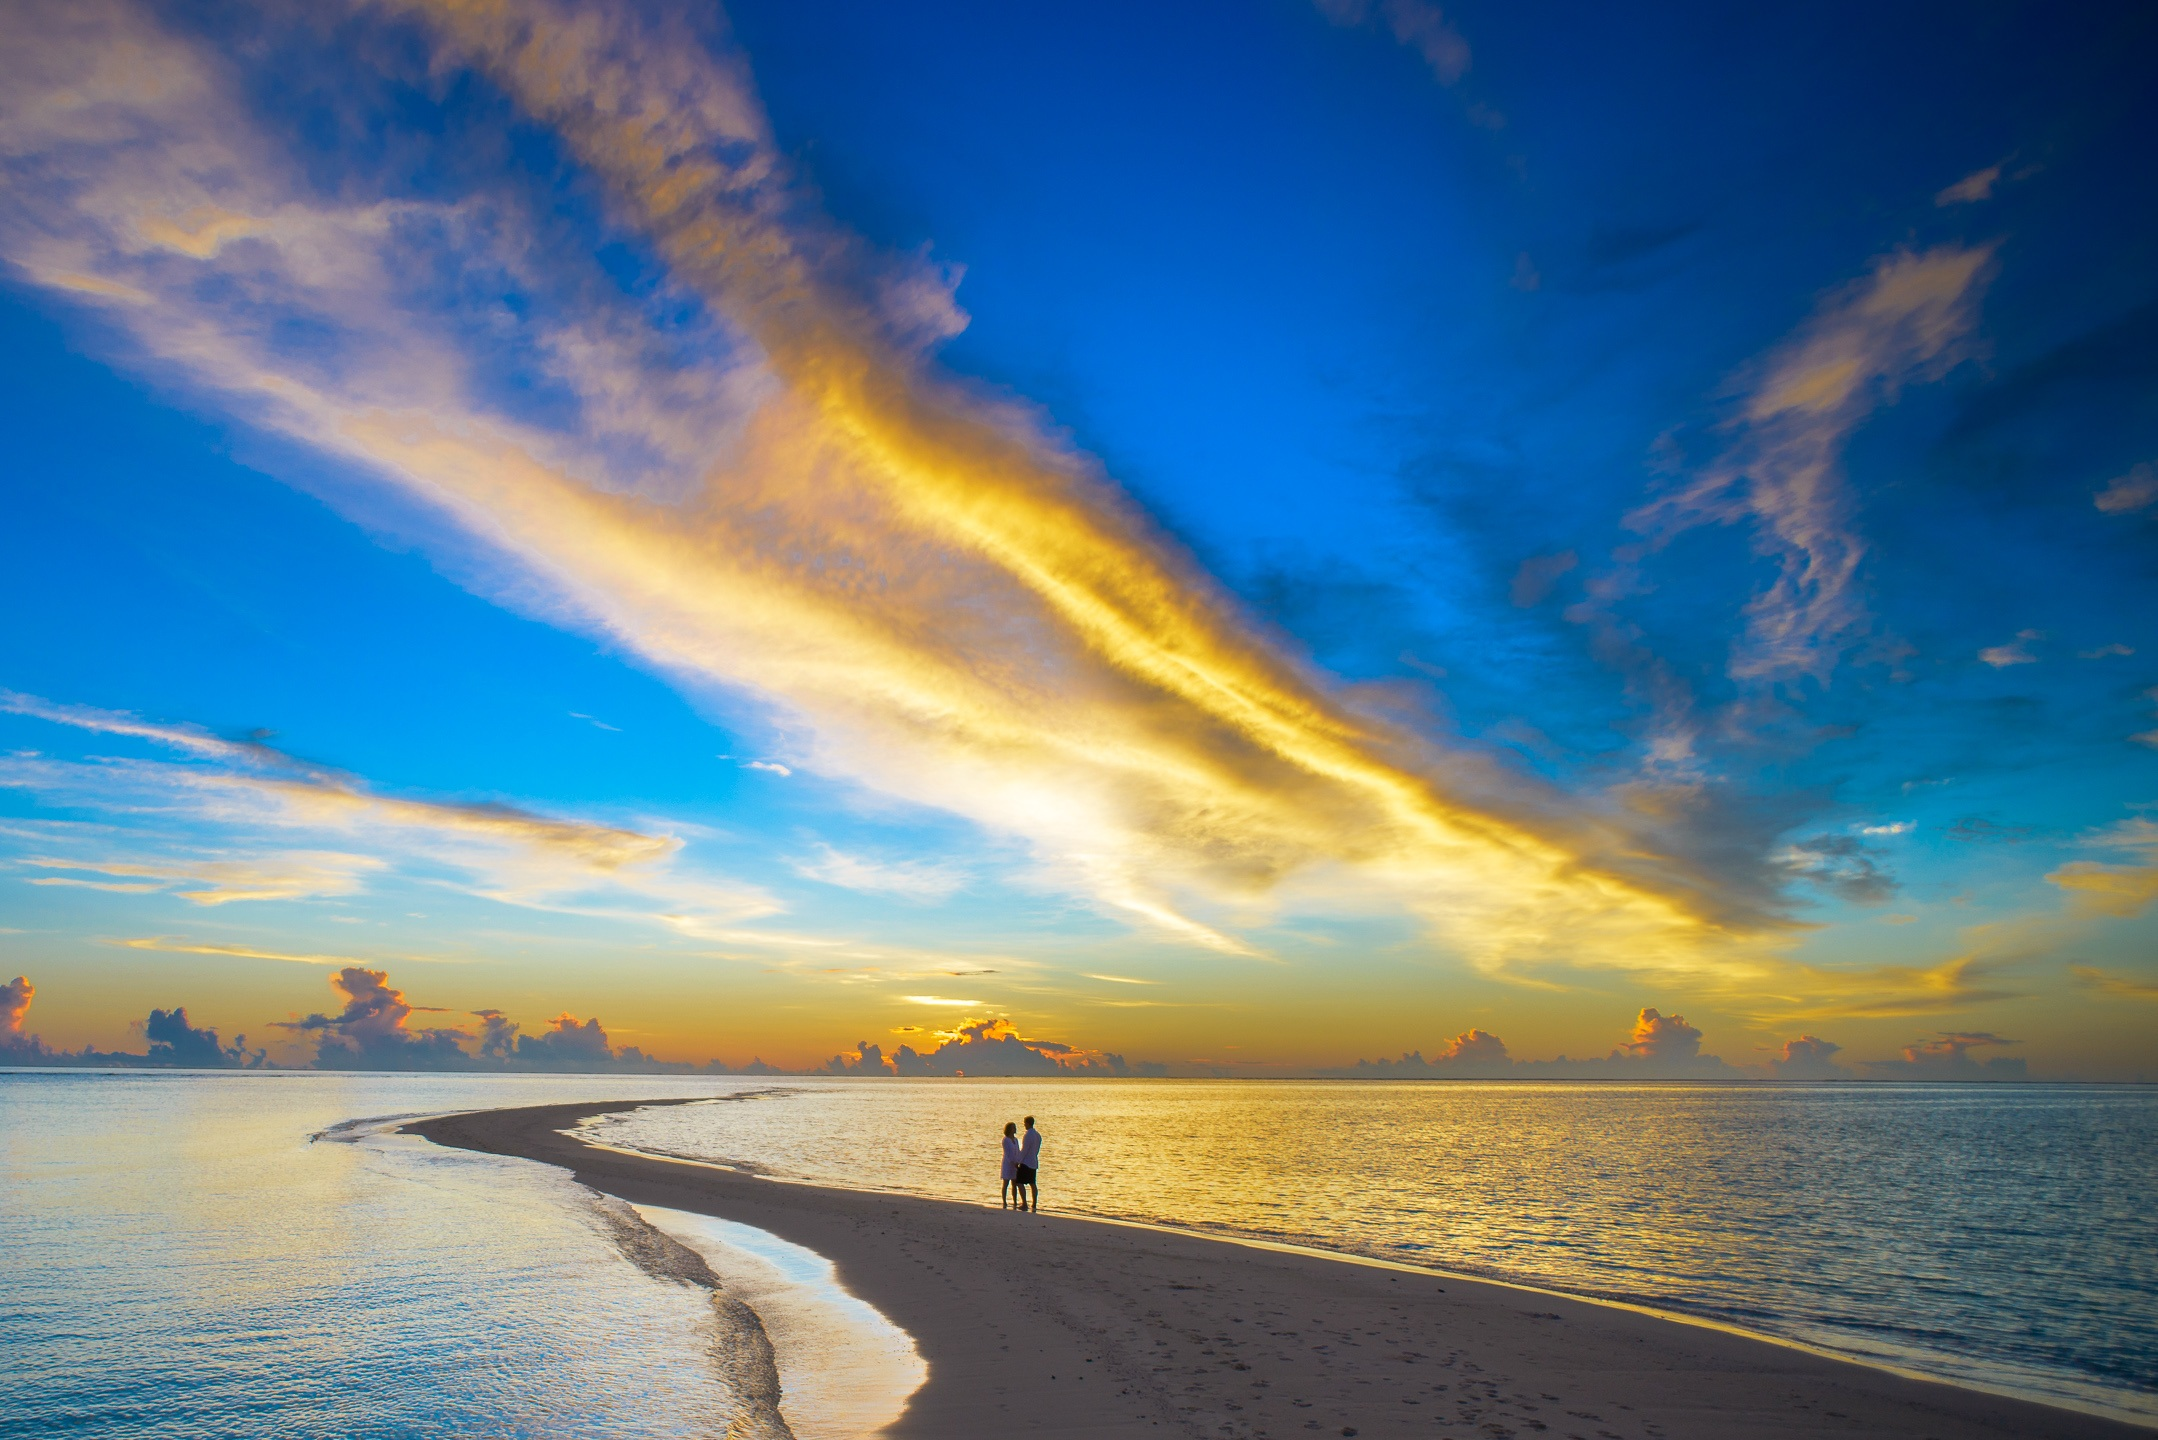 sunset-1855191